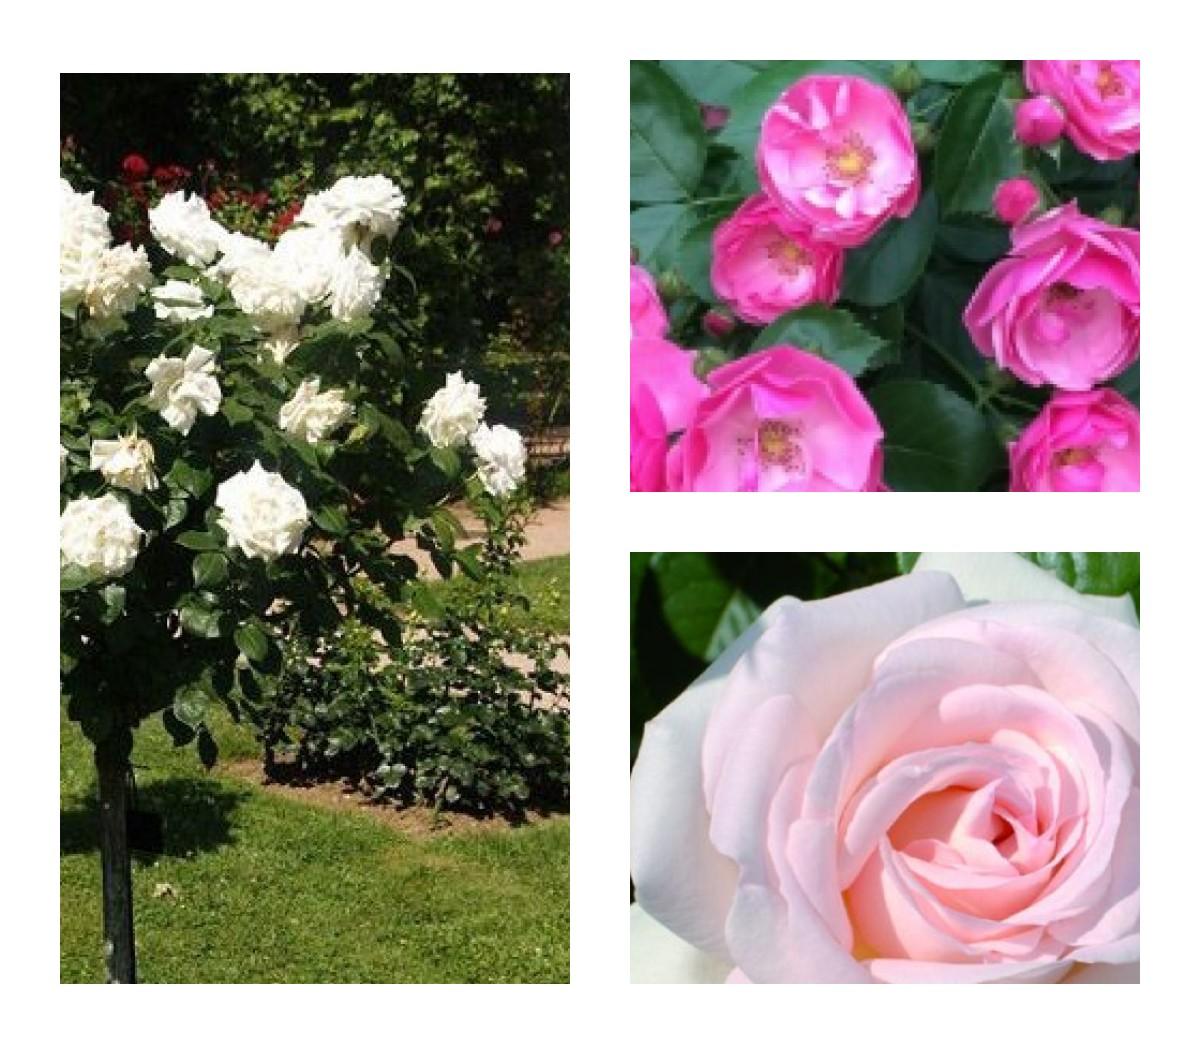 Комплект Р1-3 саженца (Штамбовые розы Александр Пушкин, Ангела, Аннапюрна): фото и описание